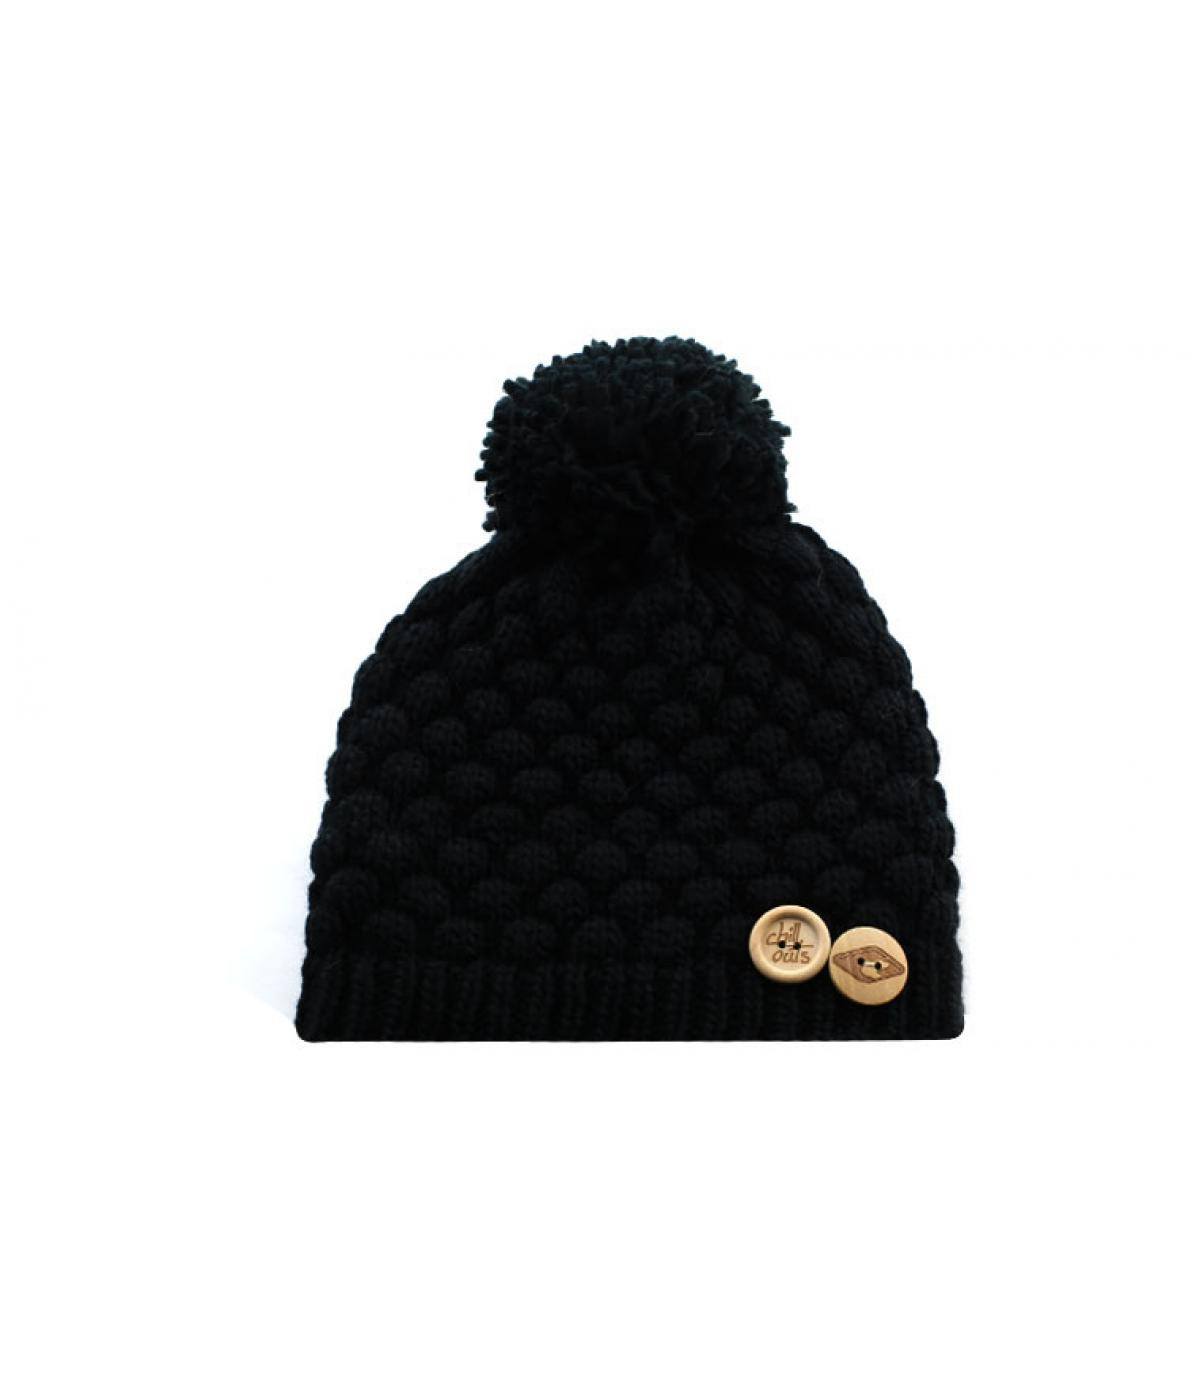 Dettagli Nora Kid Hat black - image 2